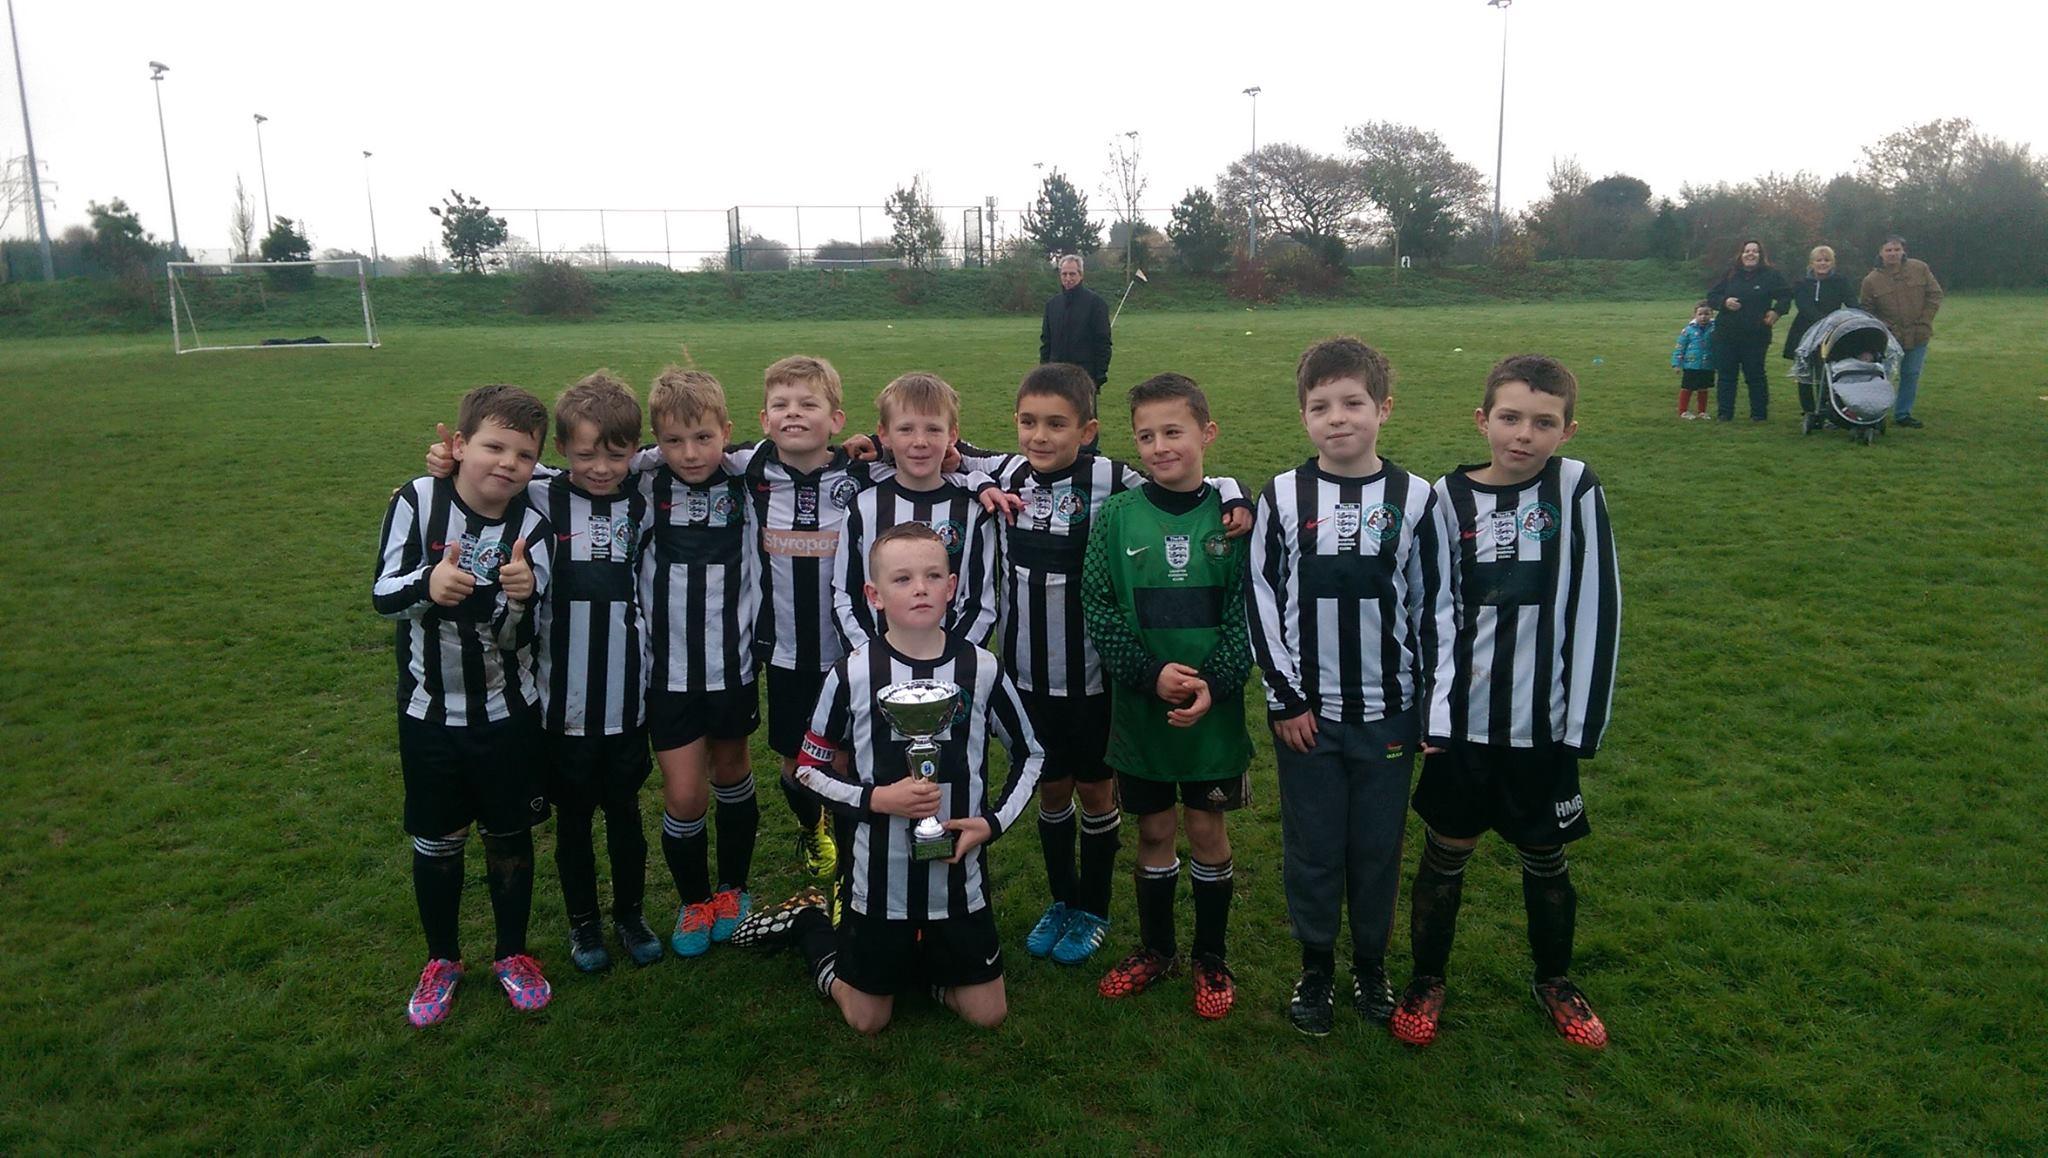 Football Clubs: Rustington Otters Football Club, Rustington, Littlehampton